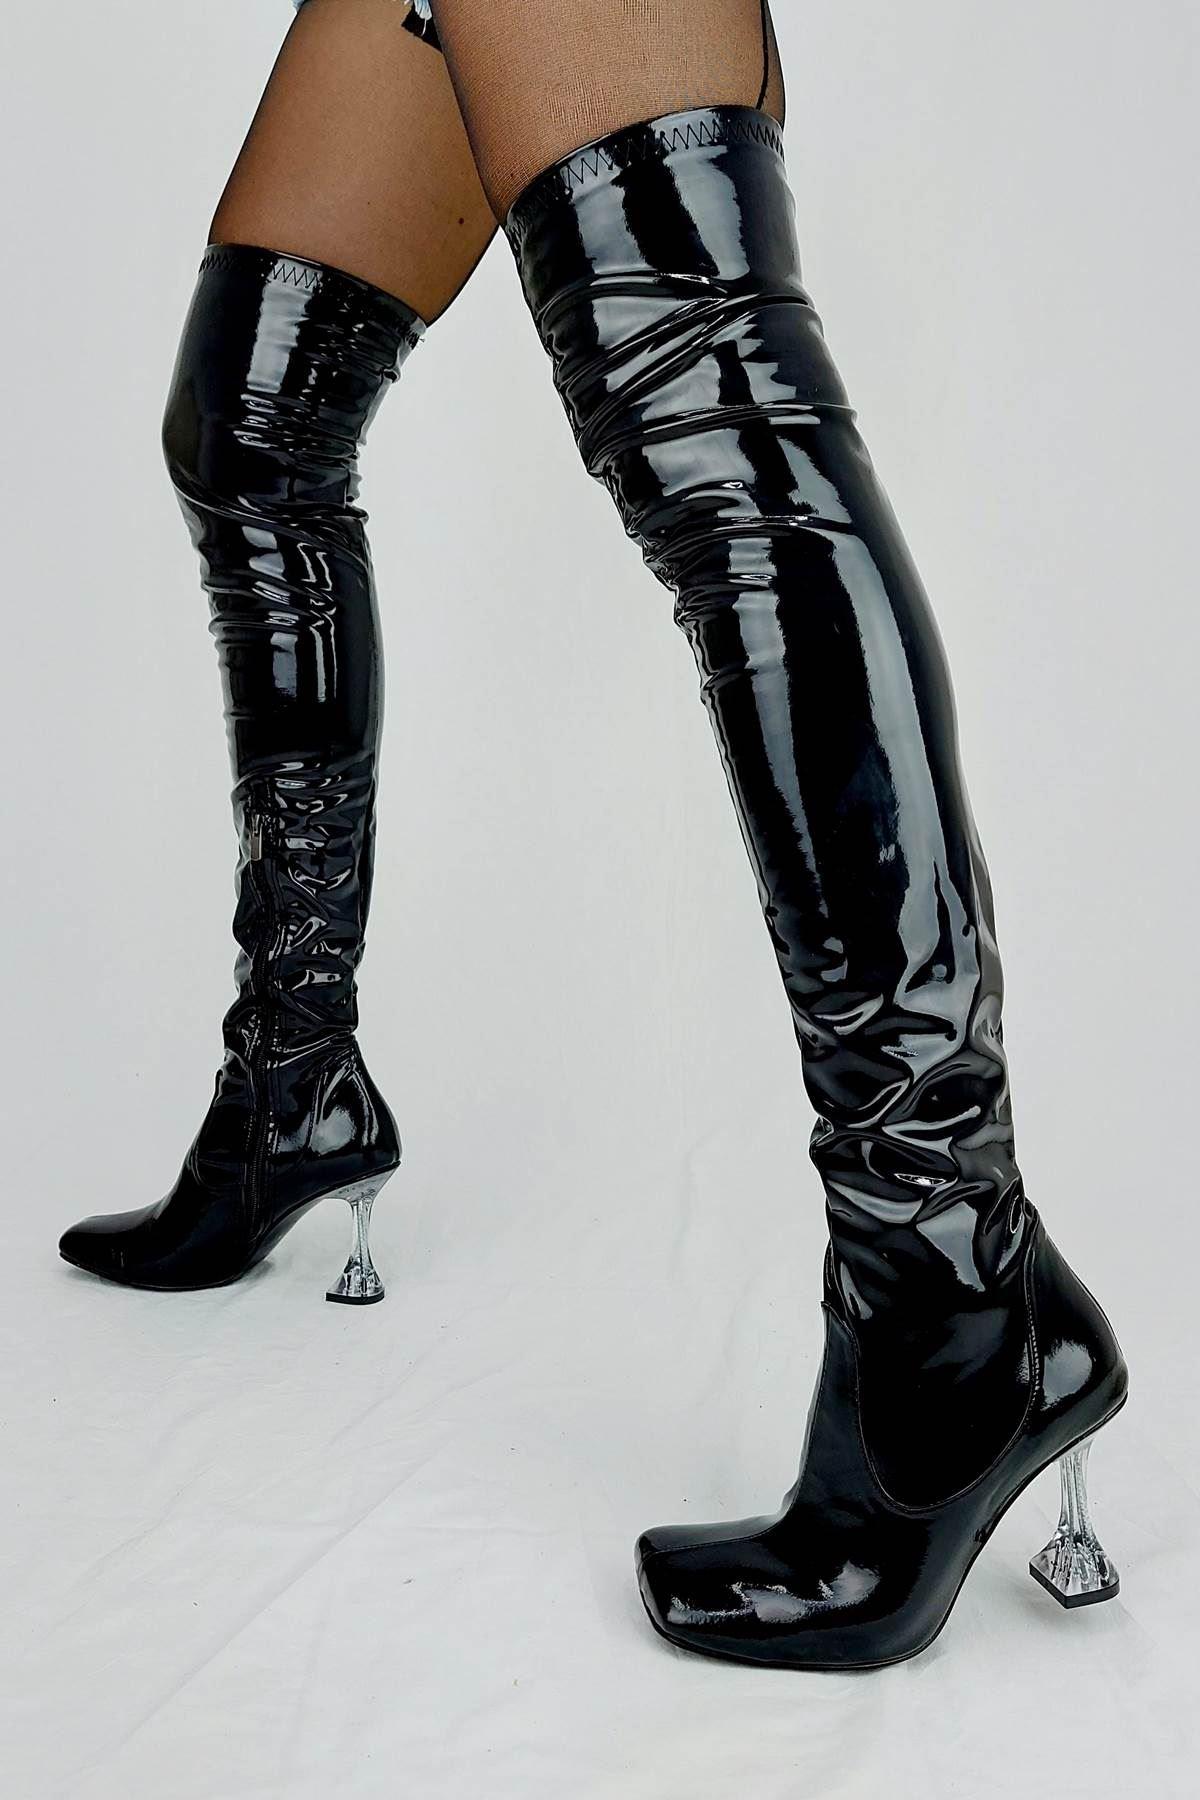 İvan Siyah Rugan Fashion Topuklu Diz Üstü Çizme